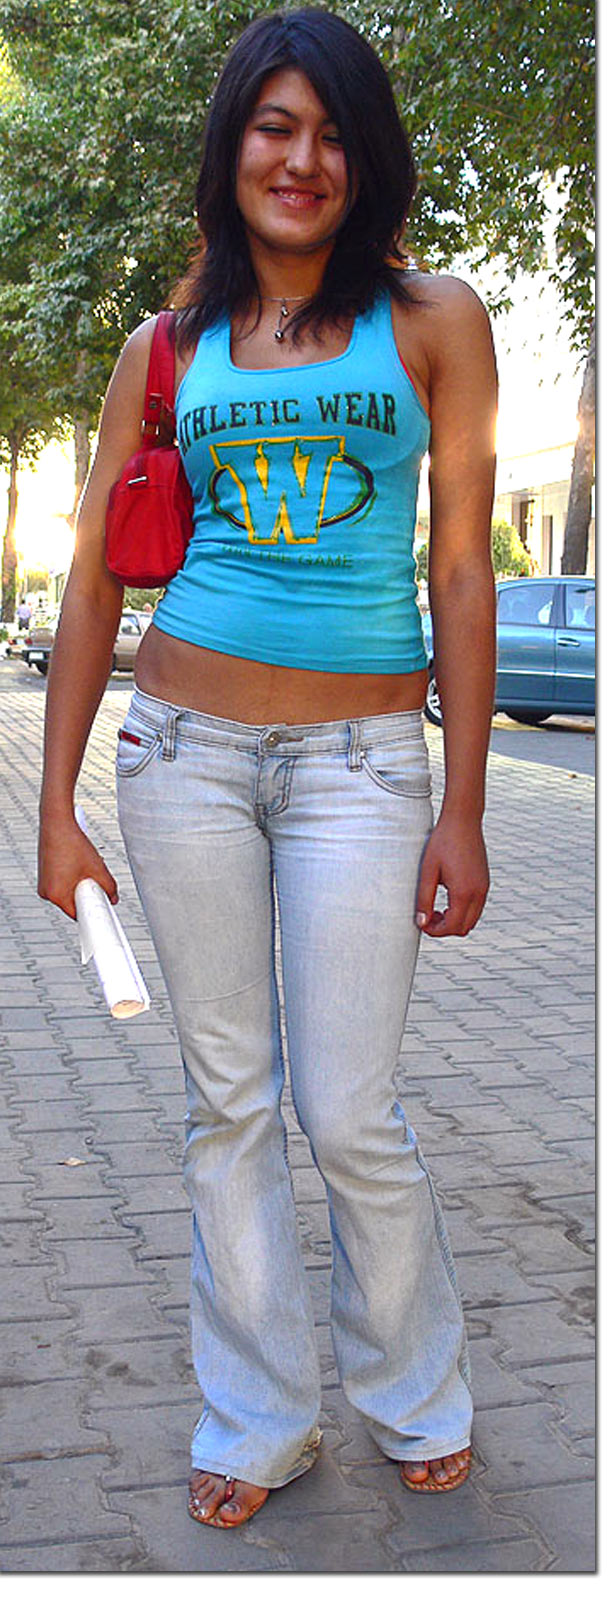 Толстые в мини бикини фото 1 фотография